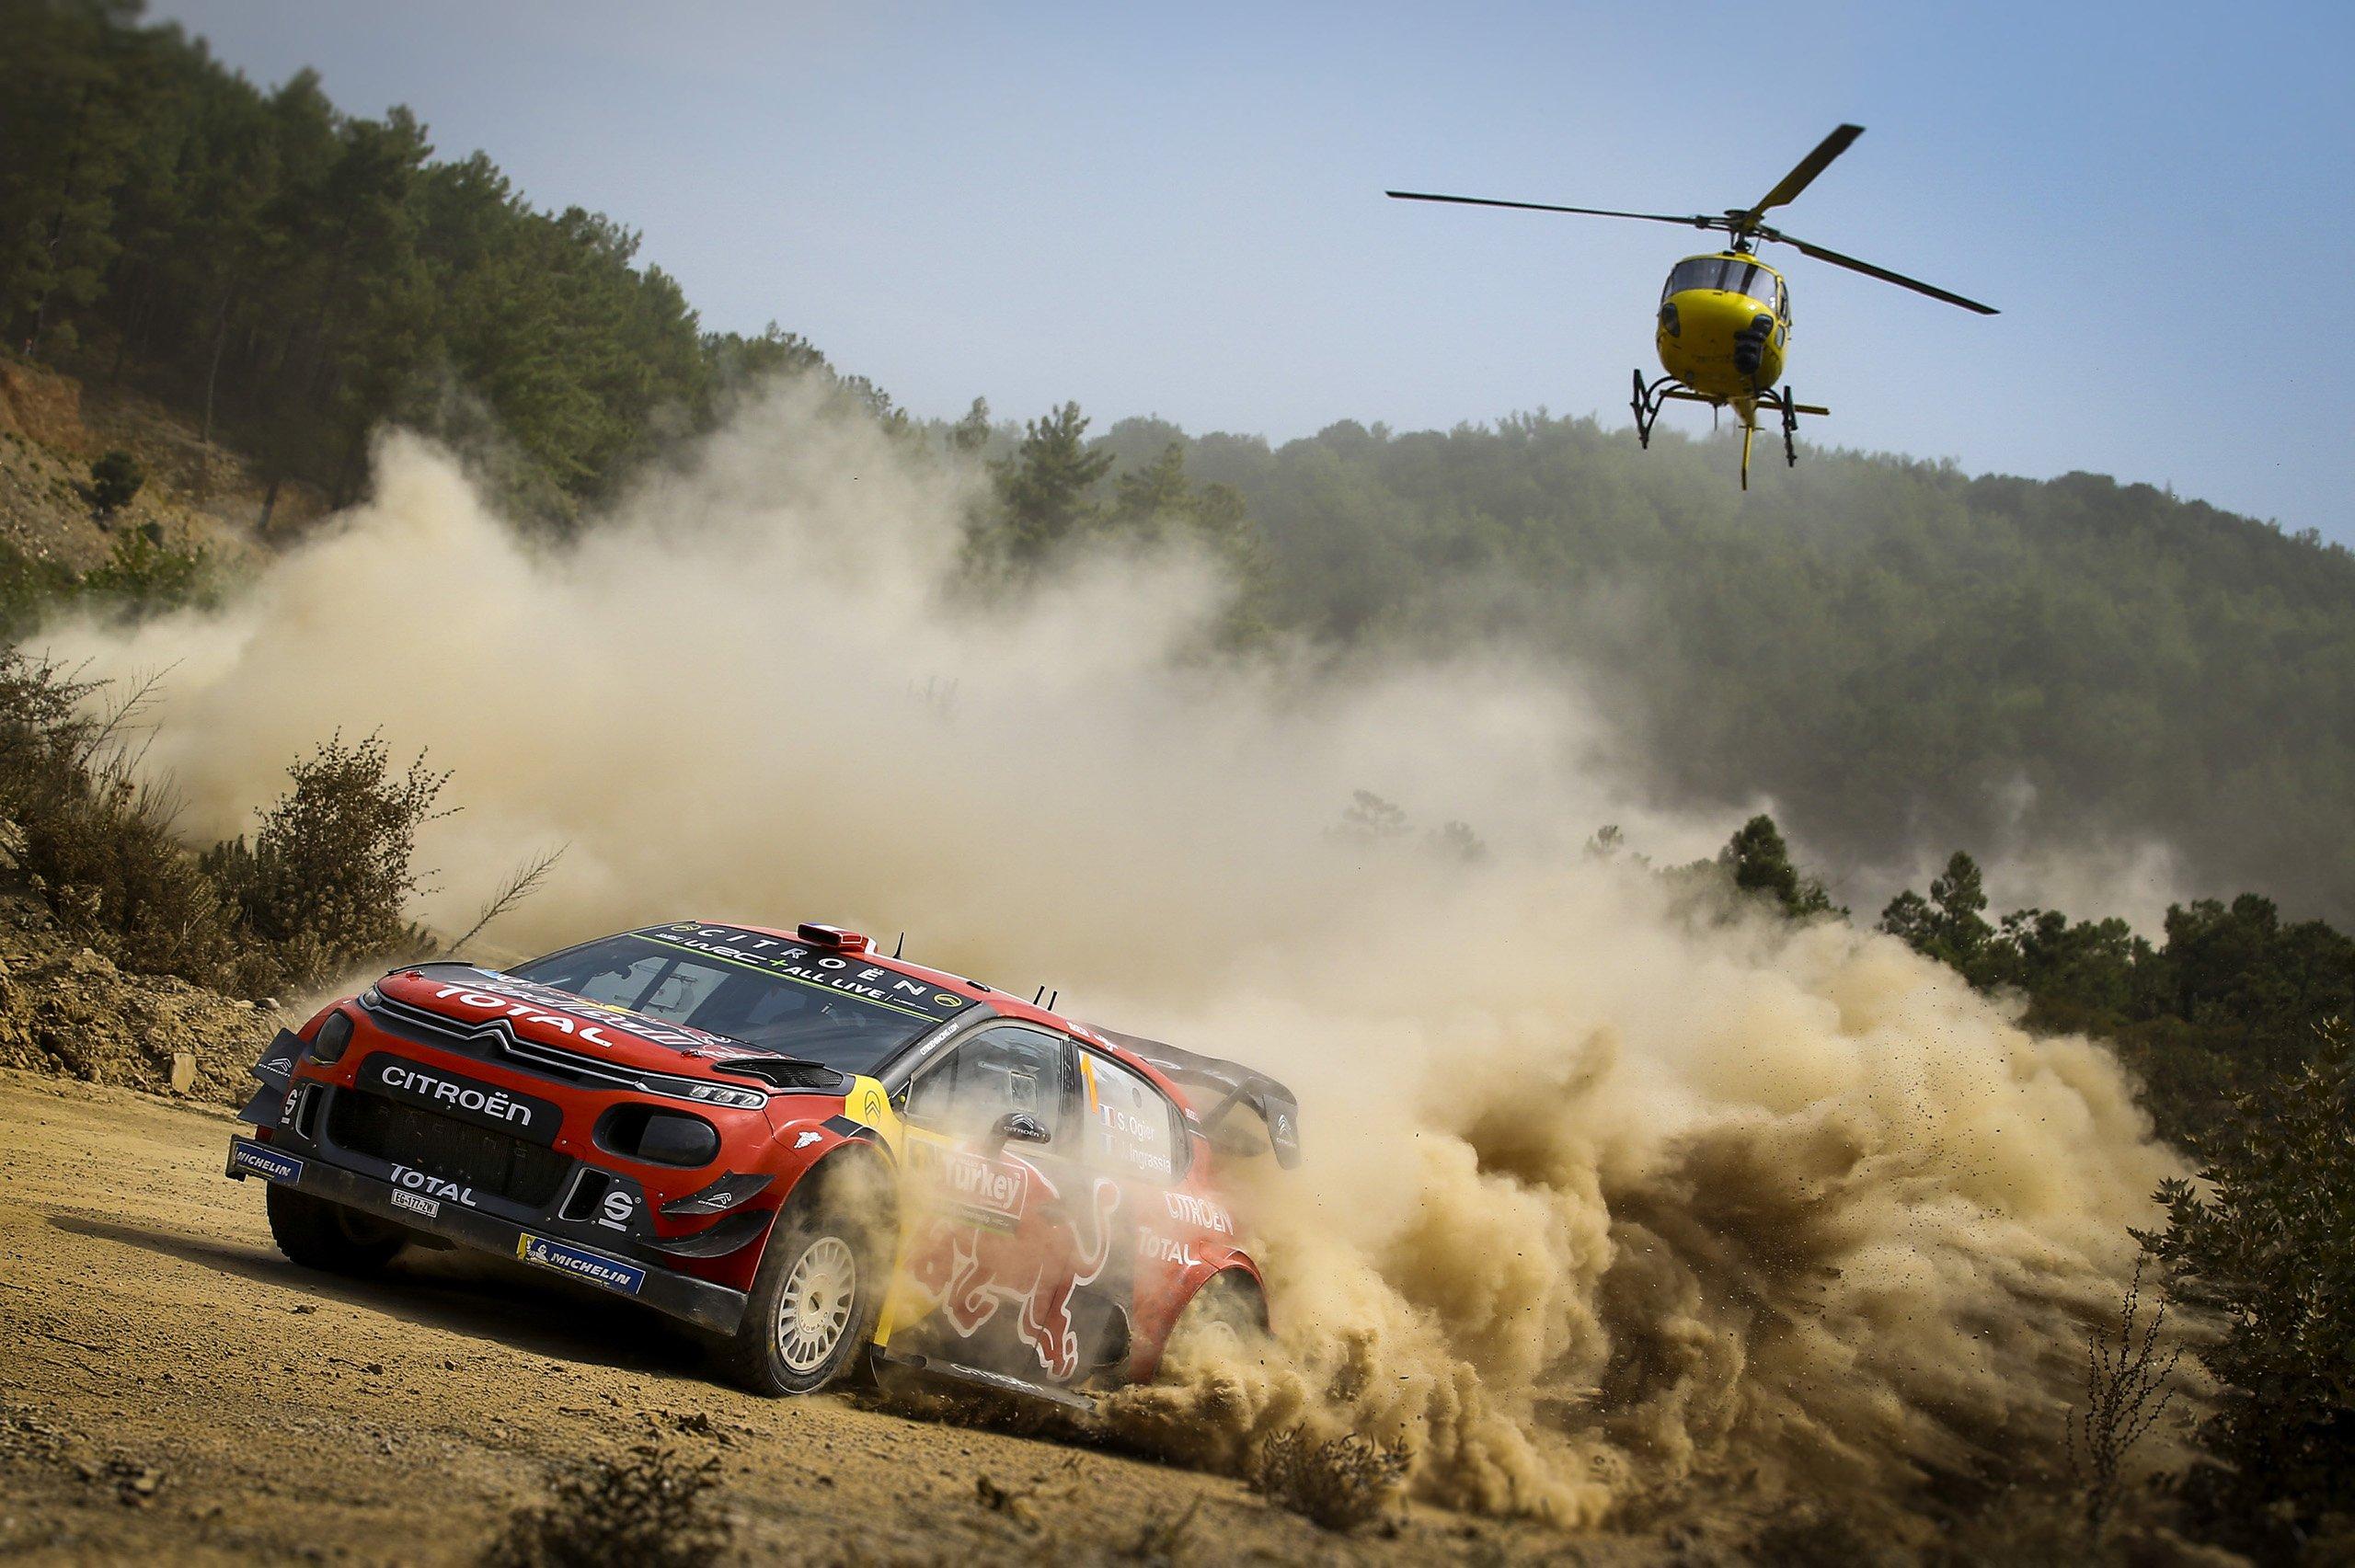 FIA World Rally Championship in Turkey